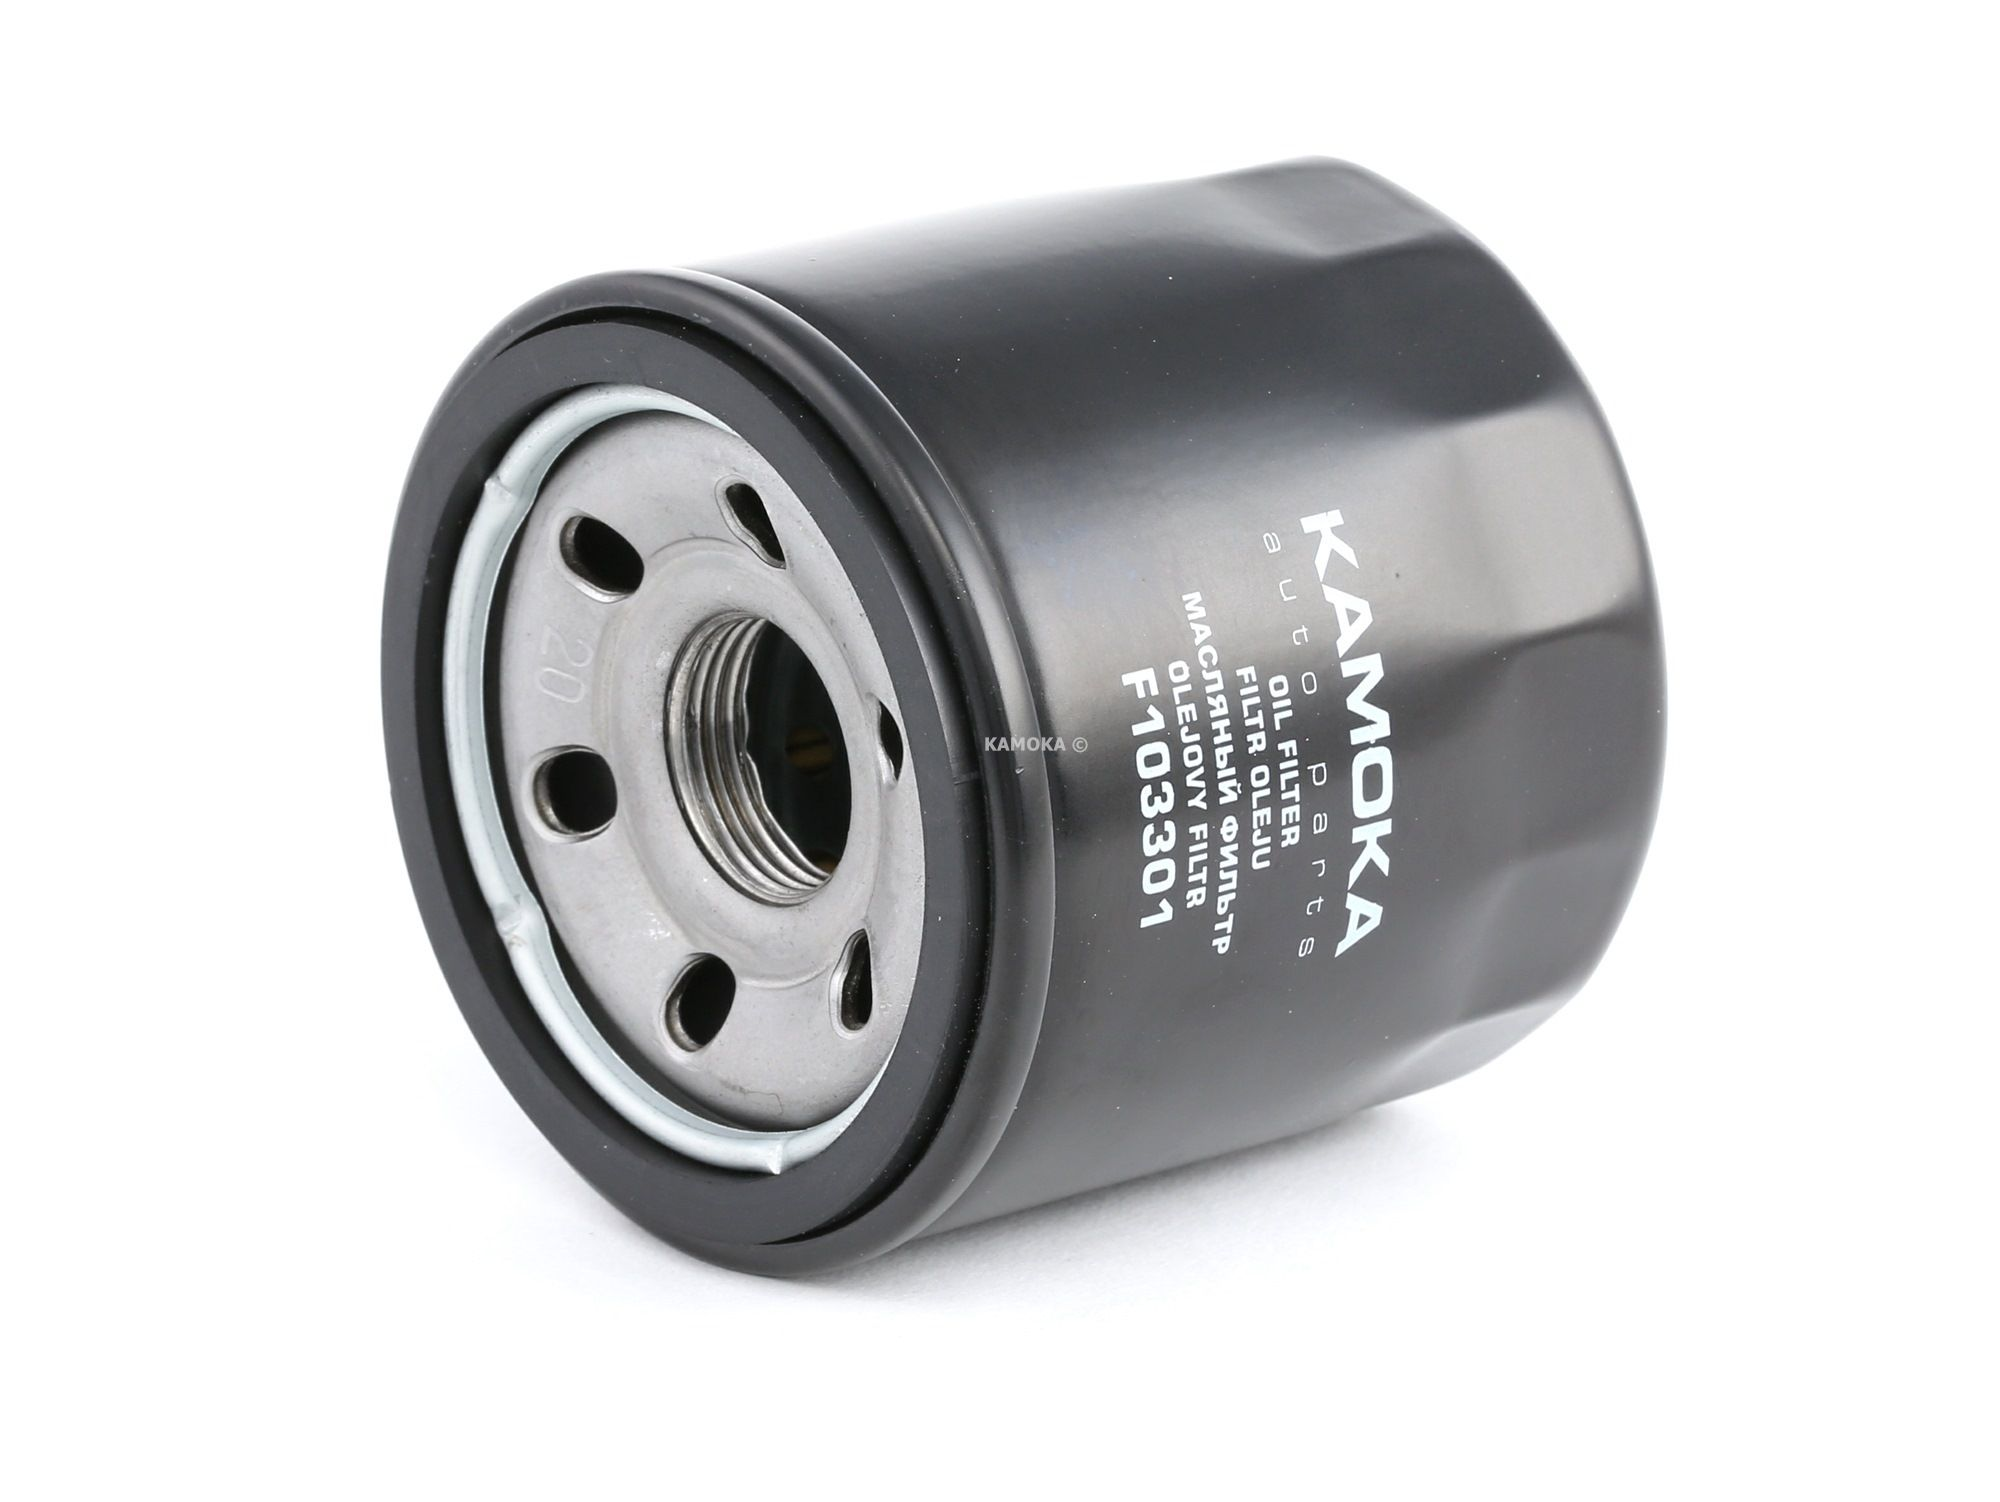 F103301 KAMOKA Anschraubfilter, mit einem Rücklaufsperrventil Ø: 68mm, Höhe: 67mm Ölfilter F103301 günstig kaufen